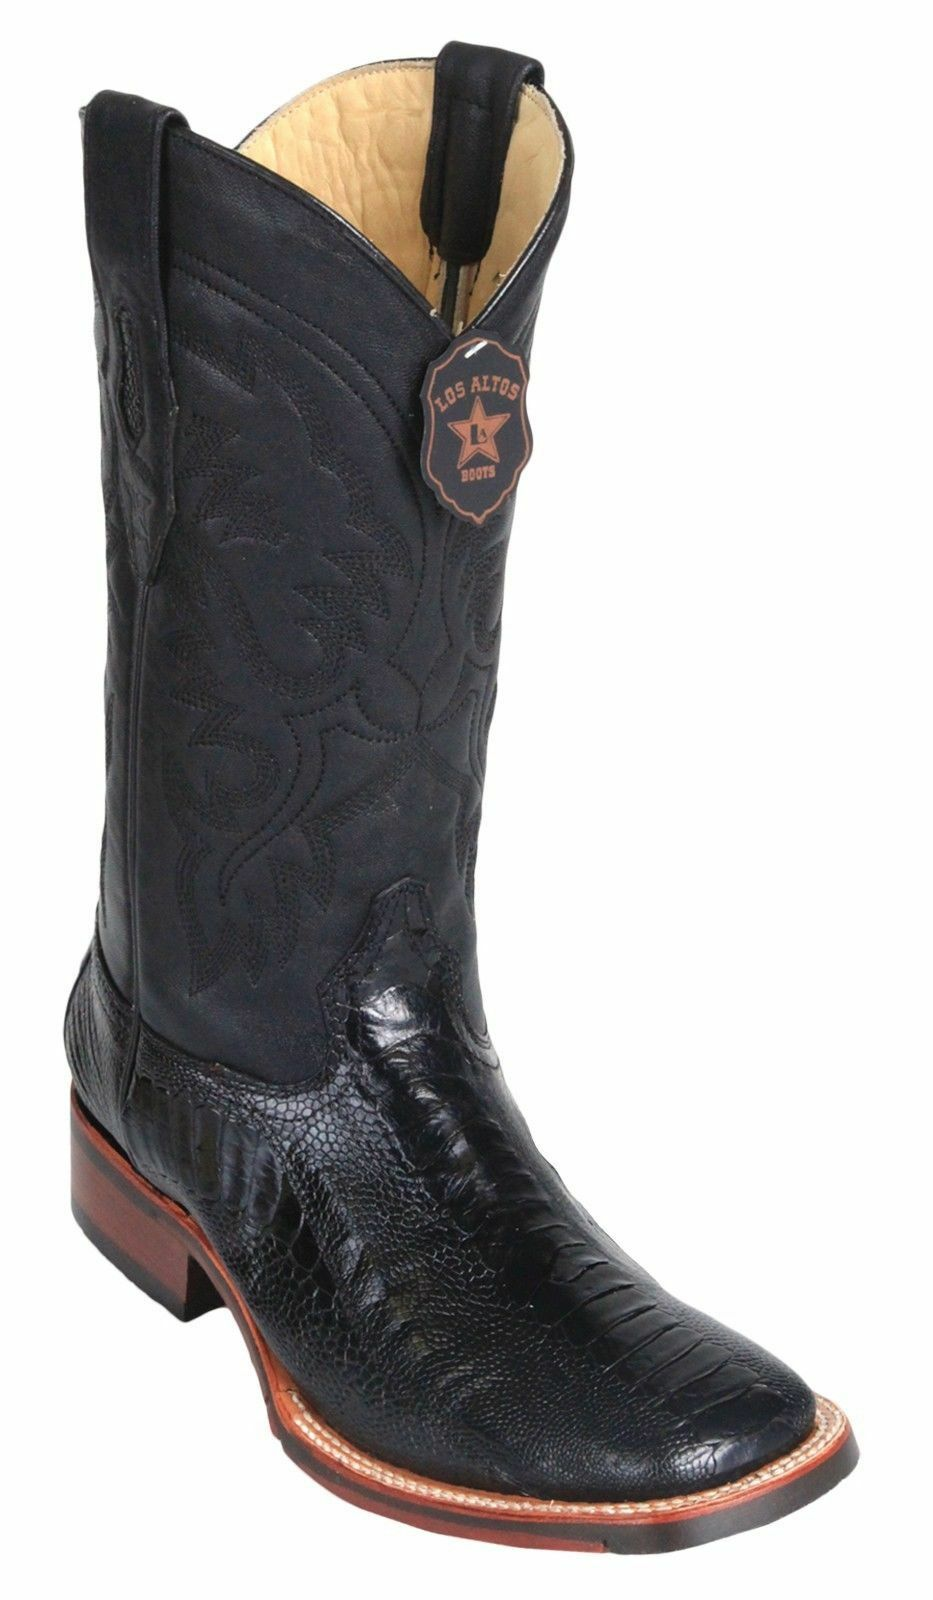 Los Altos BLACK Ostrich LEG Square Toe TPU Rubber Sole Western Cowboy Boot EE